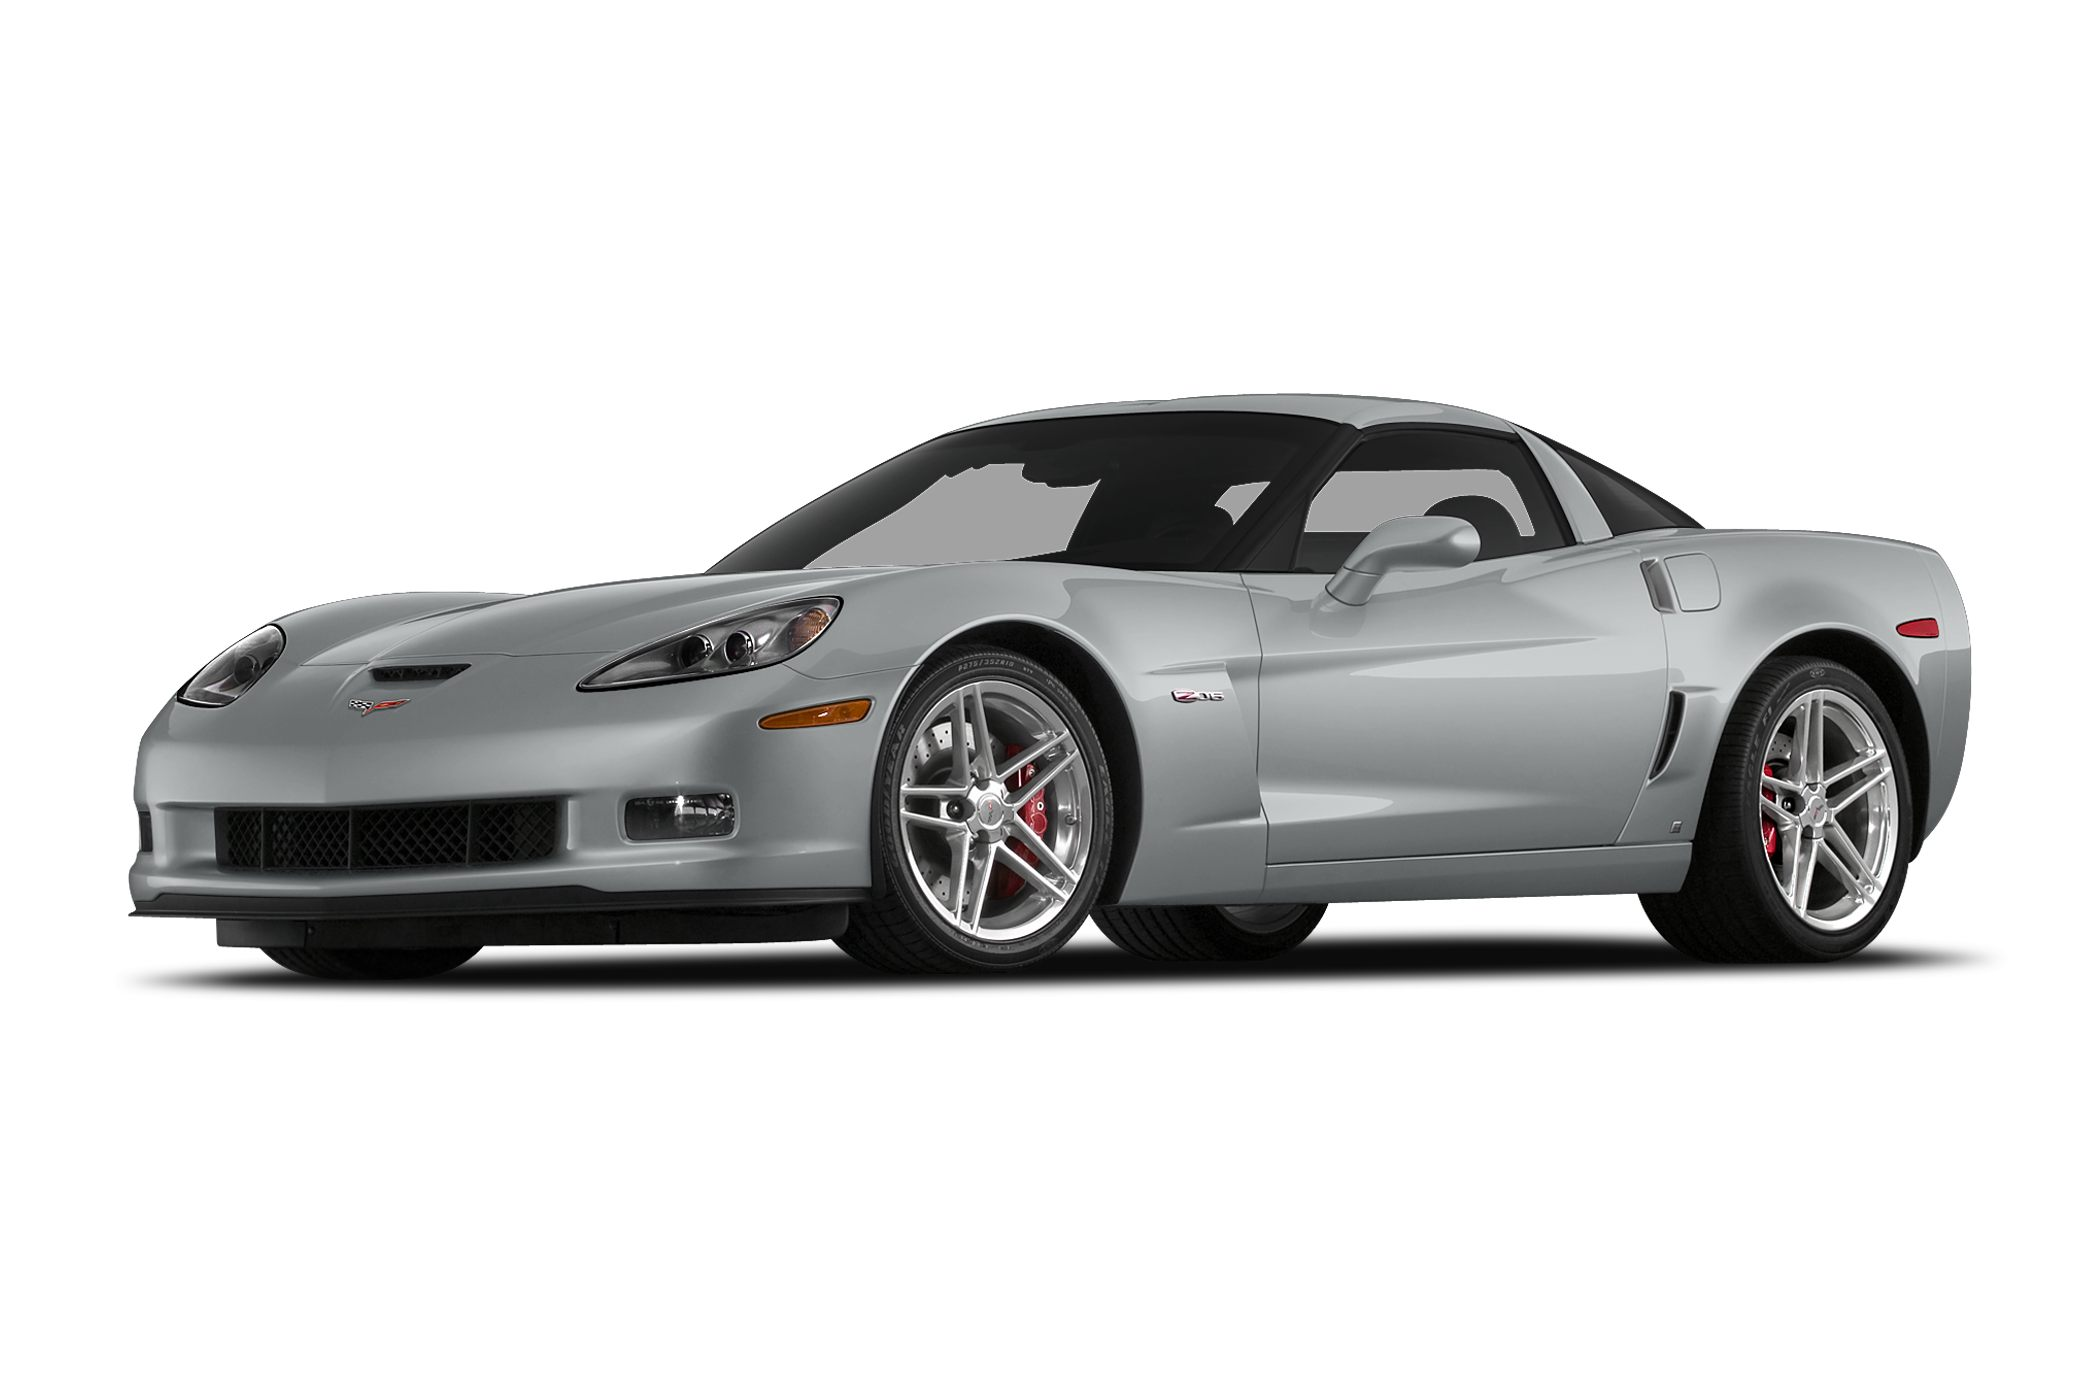 2013 Corvette Z06 >> 2013 Chevrolet Corvette Z06 Hardtop 2dr Coupe Specs And Prices